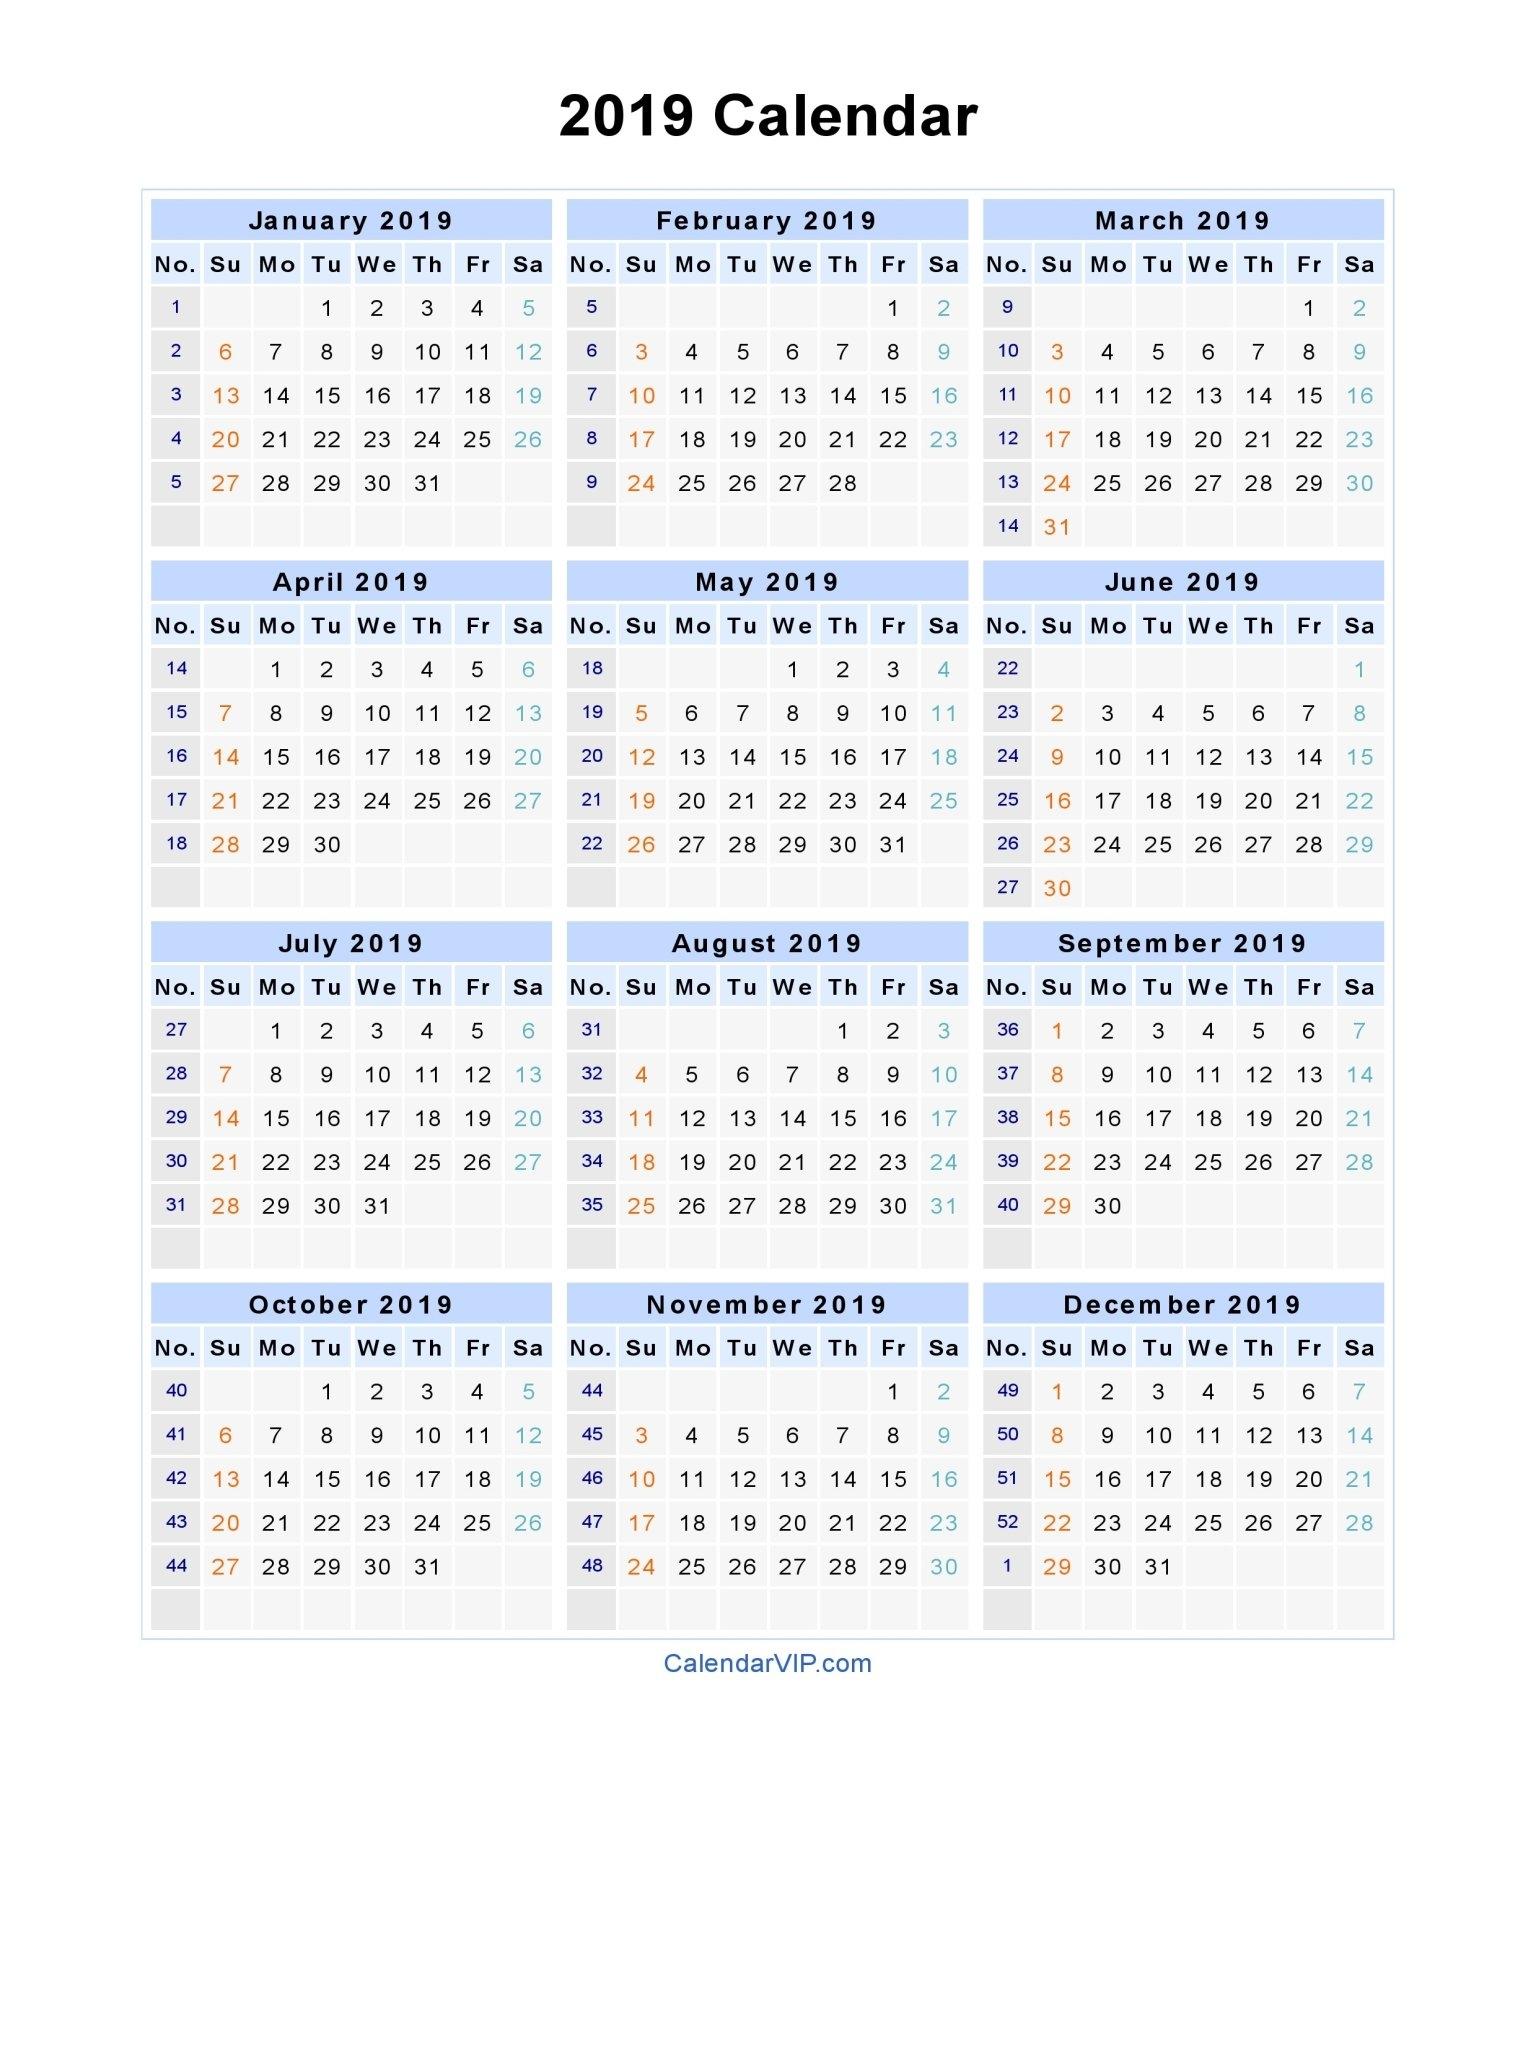 2019 Calendar – Blank Printable Calendar Template In Pdf Word Excel Calendar 2019 Microsoft